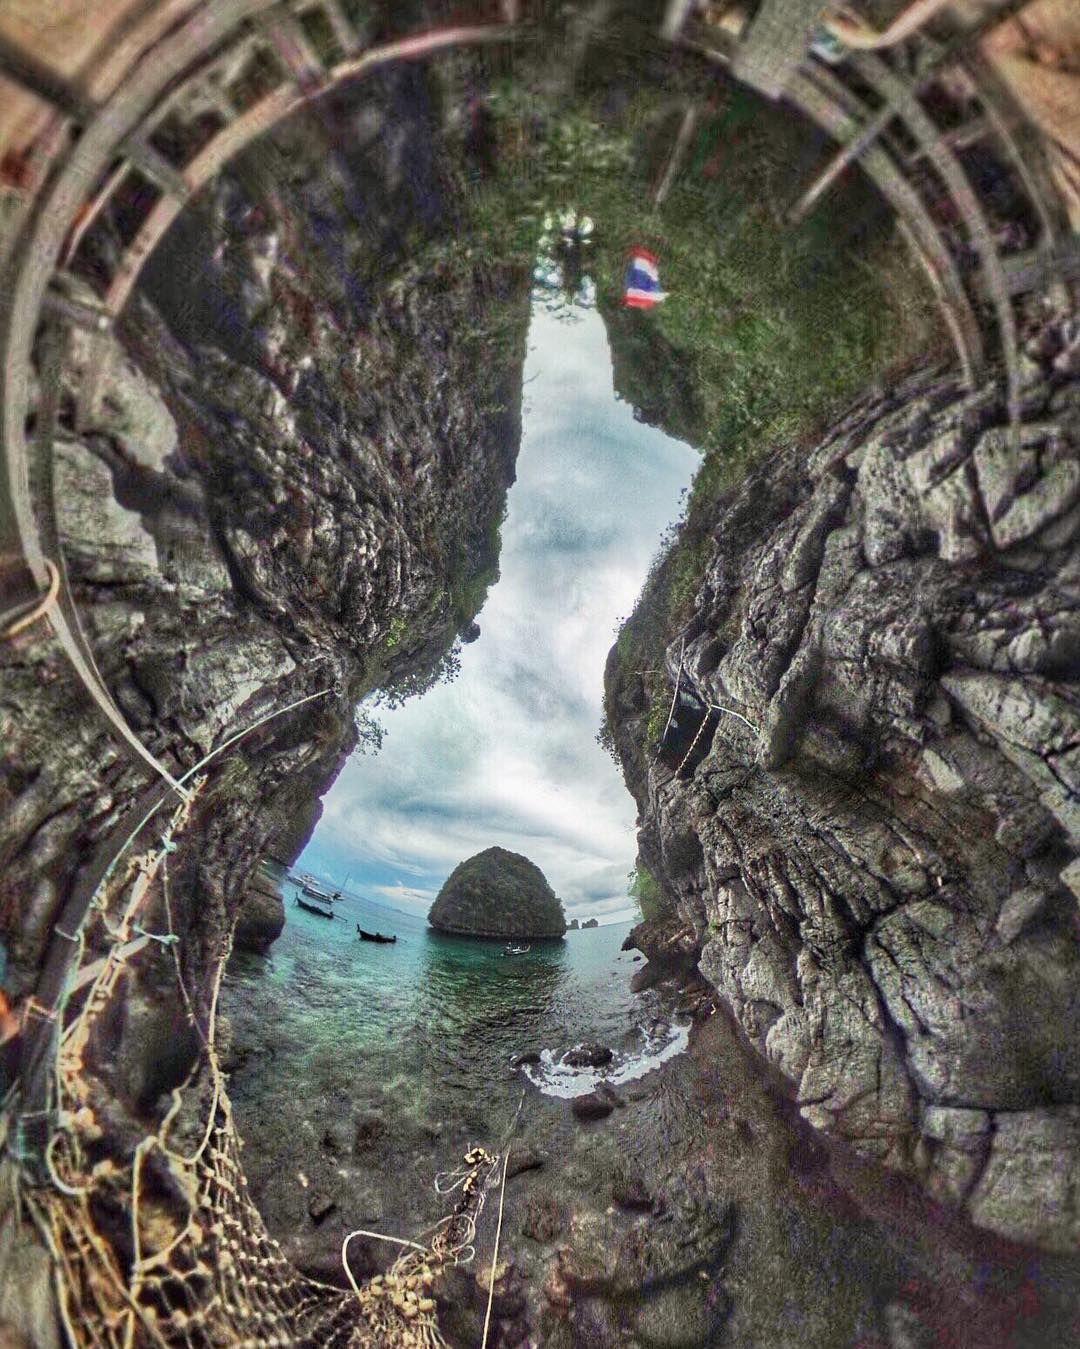 Losa #Maya #Bay #Island #PhiPhi #phukettrip  captured in #360Vodeo & #Photo #VR #VirtualReality  @printly.me by ibander - Shop VR at VirtualRealityDen.com